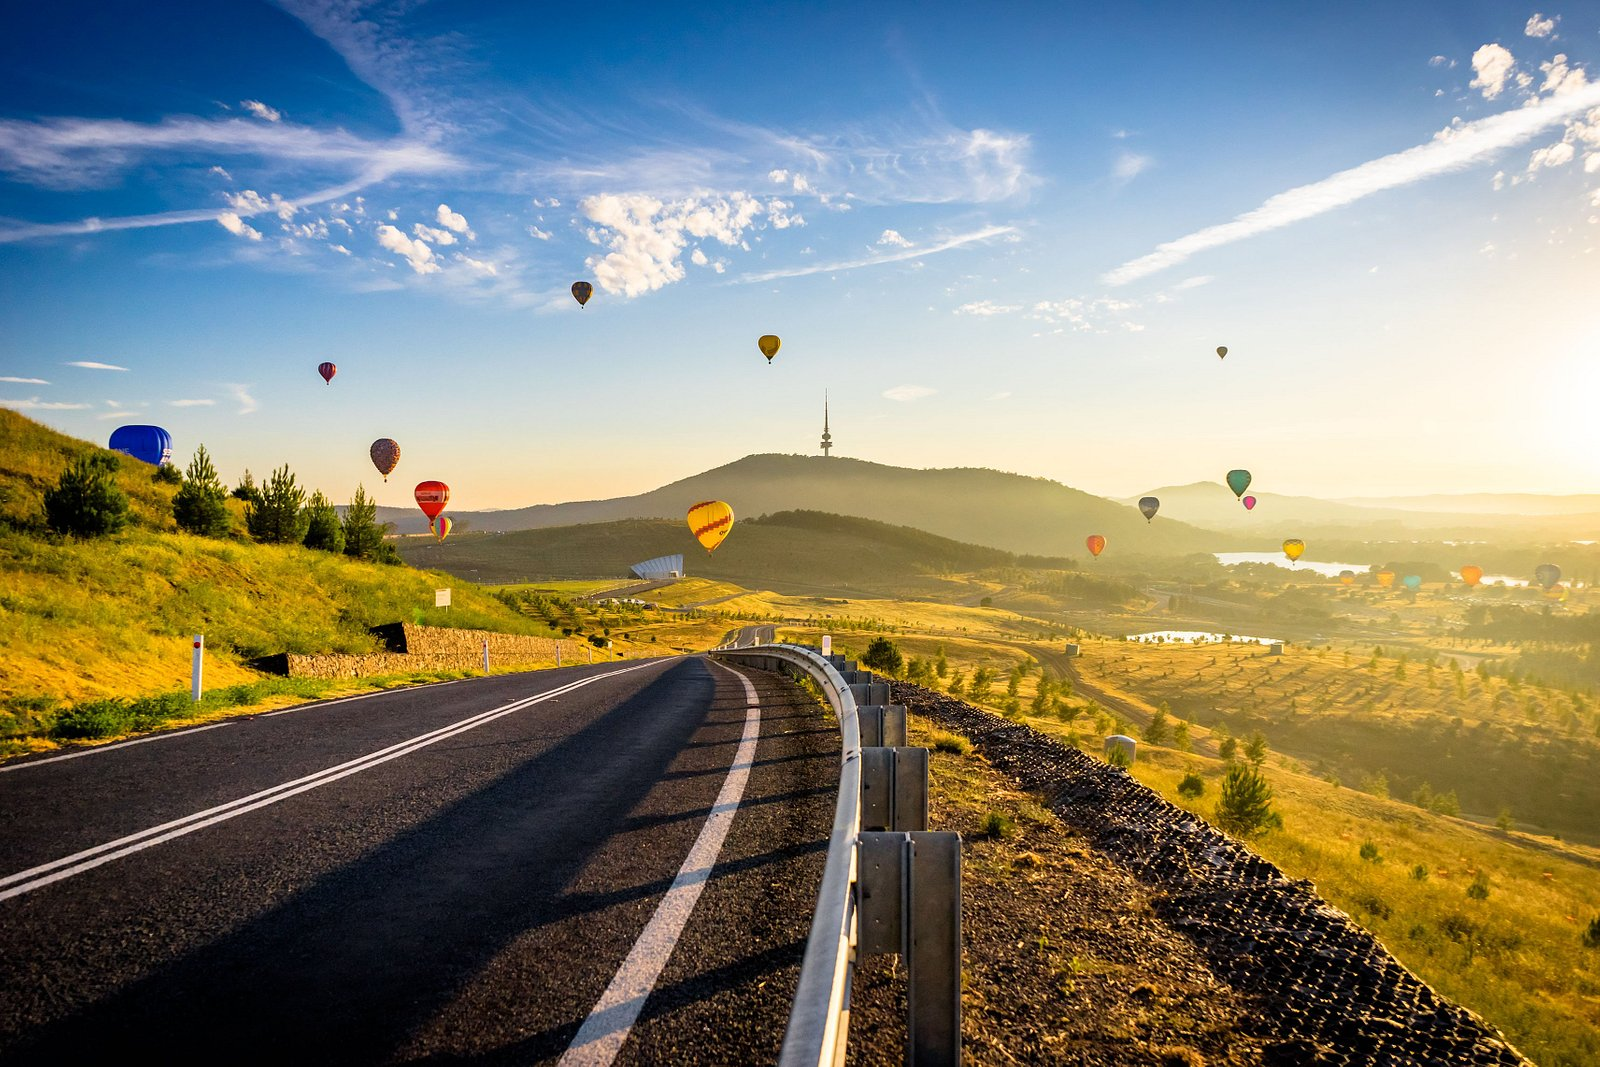 Balloons aloft over the National Arboretum Canberra